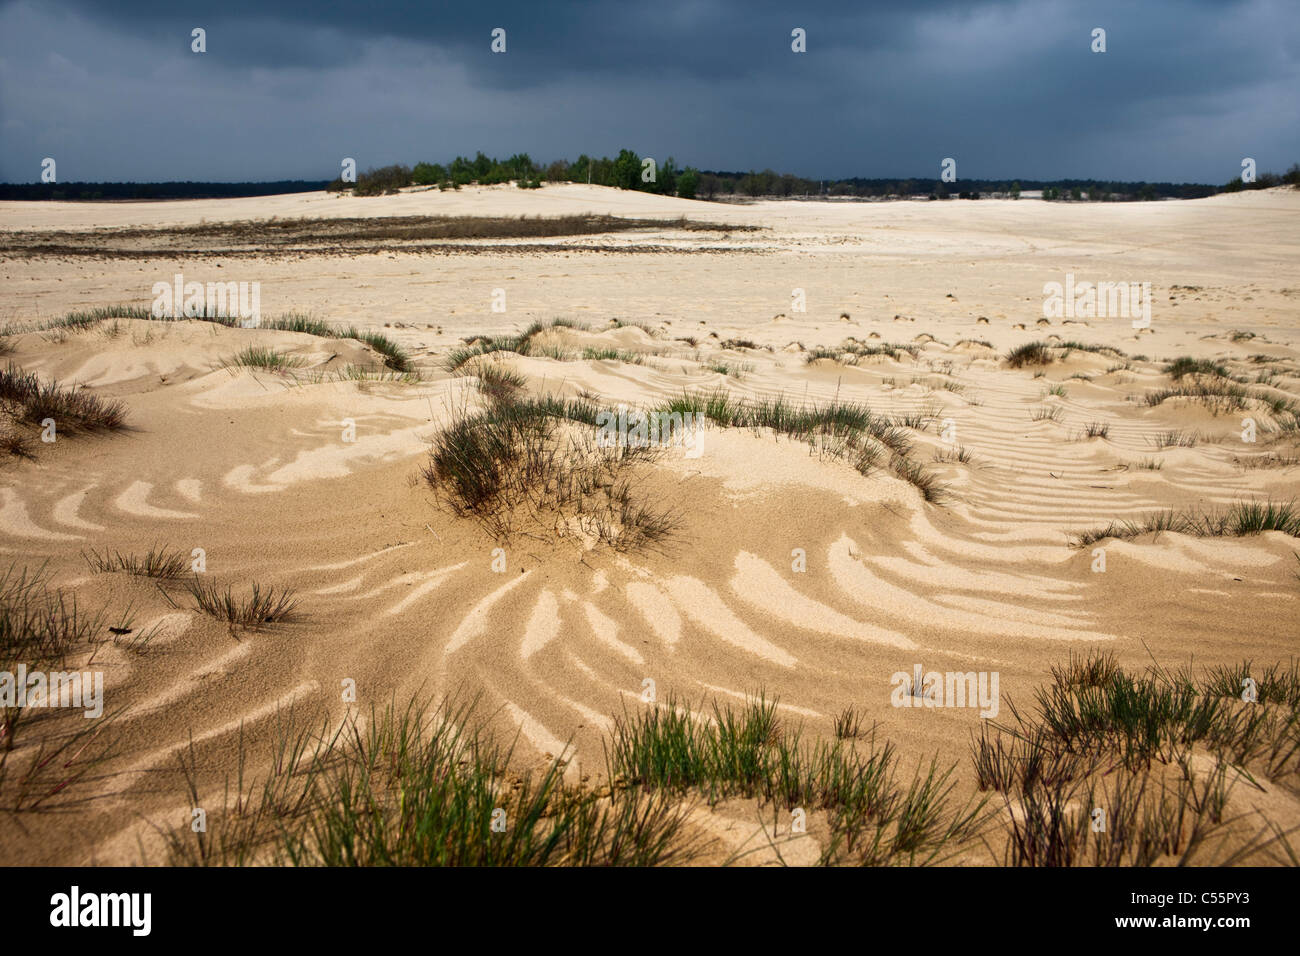 The Netherlands, Loon op Zand, National Park De Loonse en Drunense Duinen. Sand landscape. - Stock Image